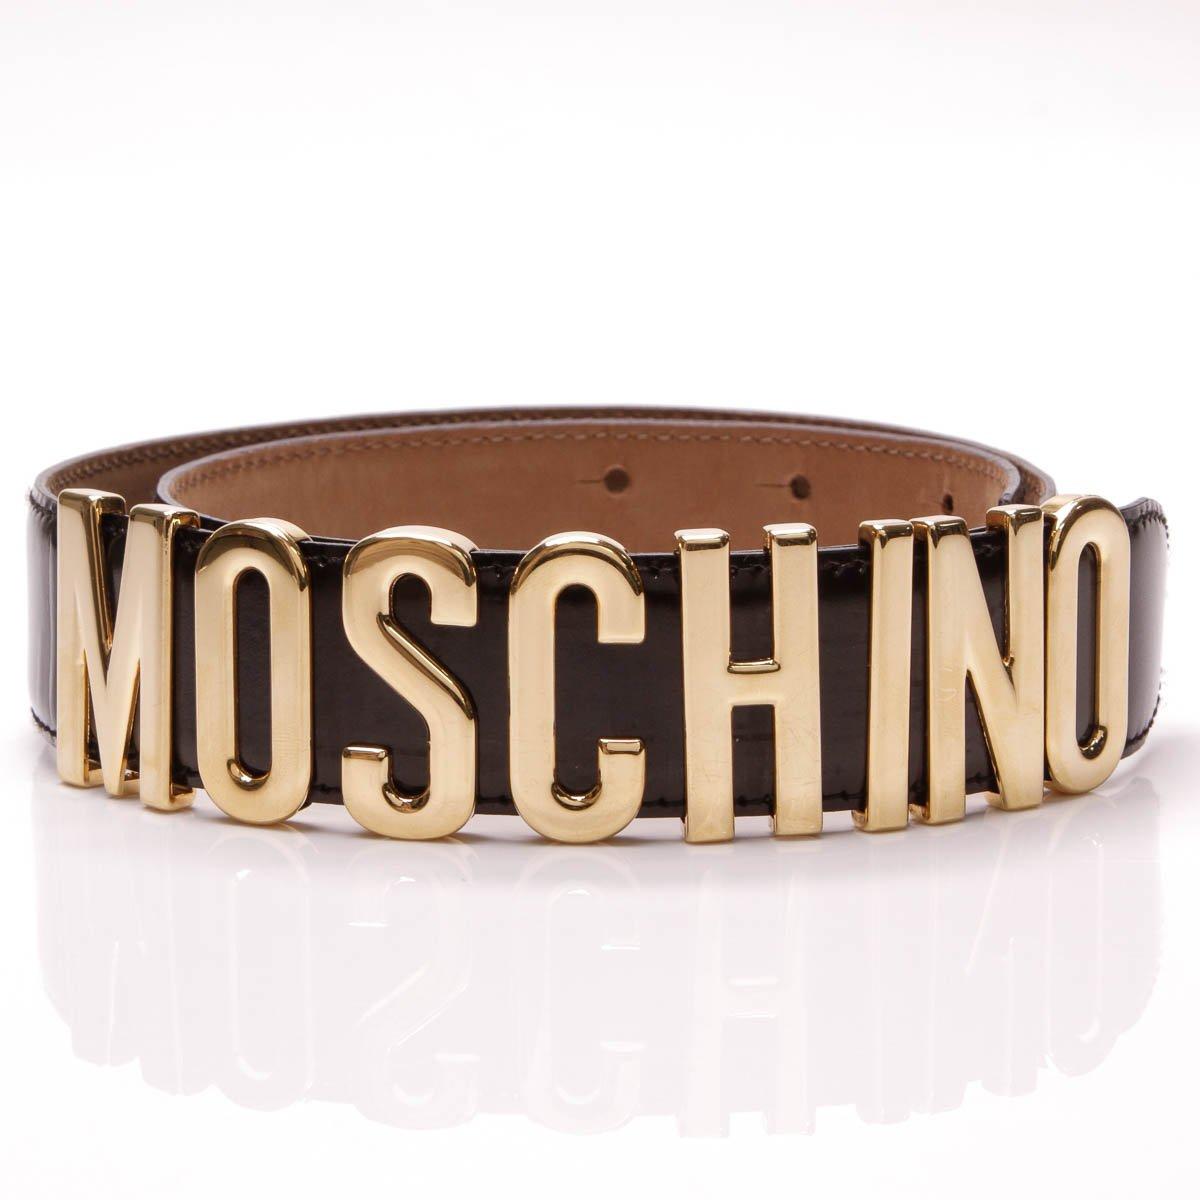 d6f5806804fd56 Us too. Make a statement with #Moschino! . . . #CoutureUSA #Tampa #luxury # designer #belt #accessoriespic.twitter.com/1Vmg6tvLqL